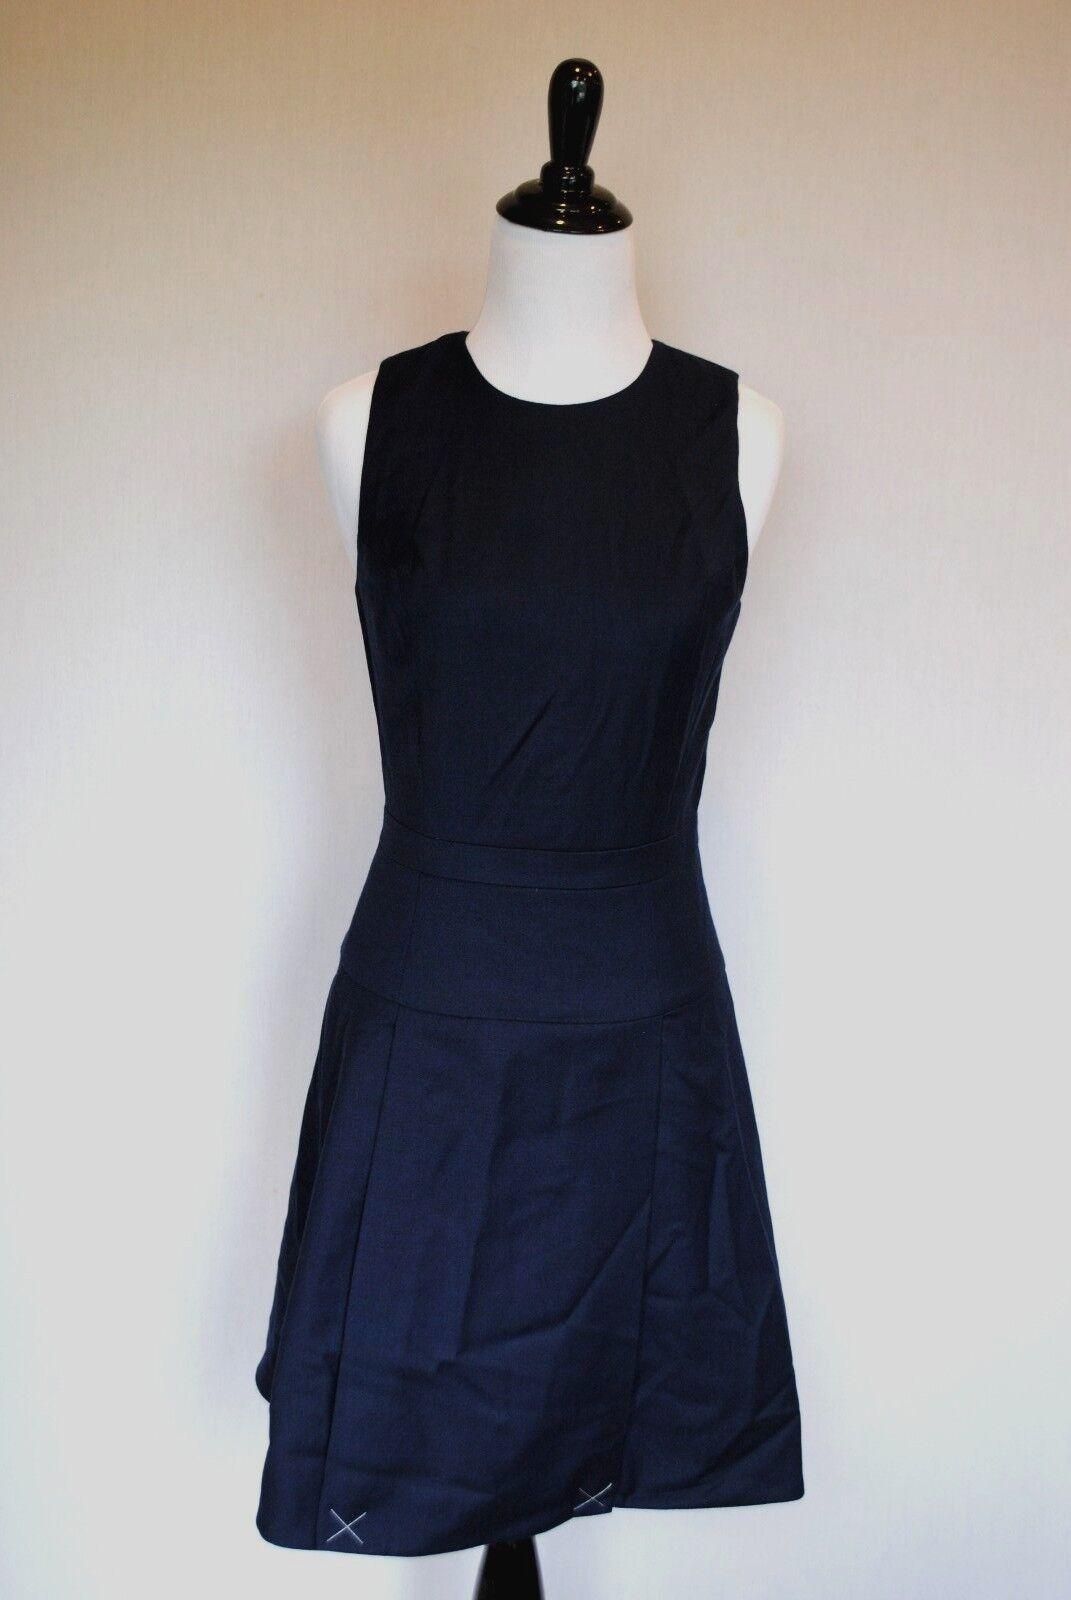 NWT J Crew Pleated Stretch Flannel Dress in Heather Indigo 0 Extra Small